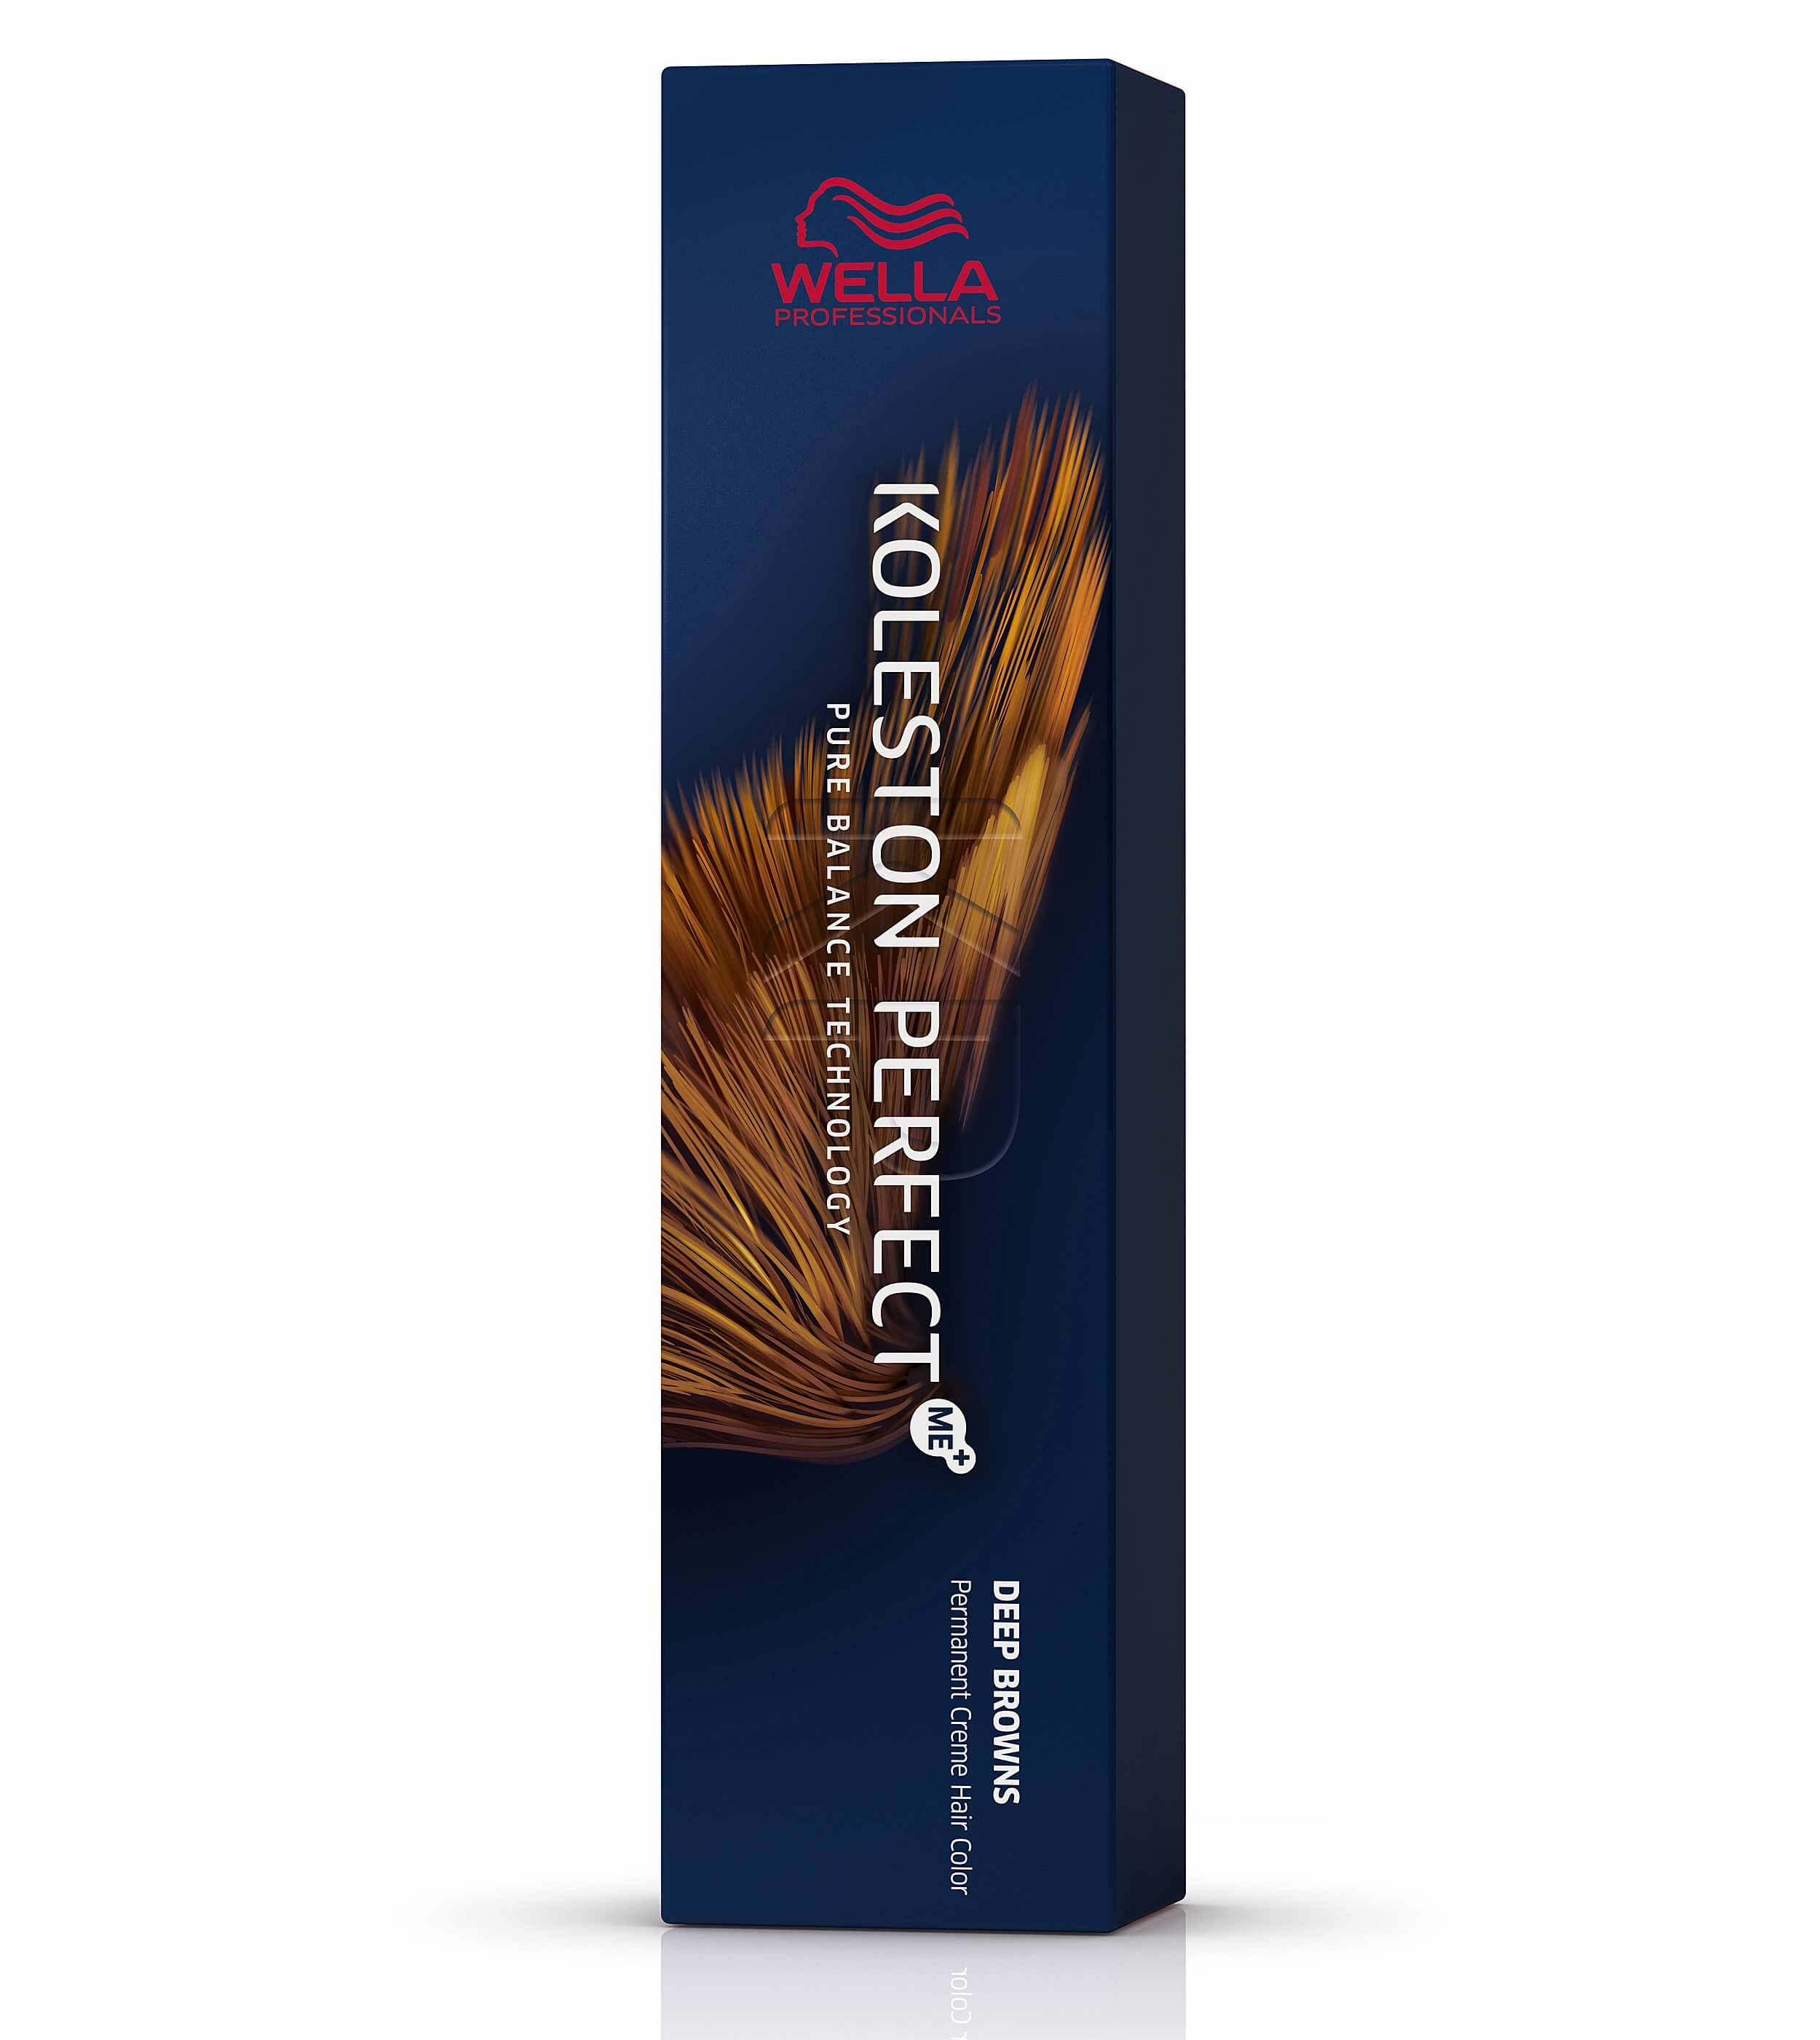 Echoscoiffure-produits-de-coiffure-professionnels-wella-professional-koleston-perfect-me-02.jpg